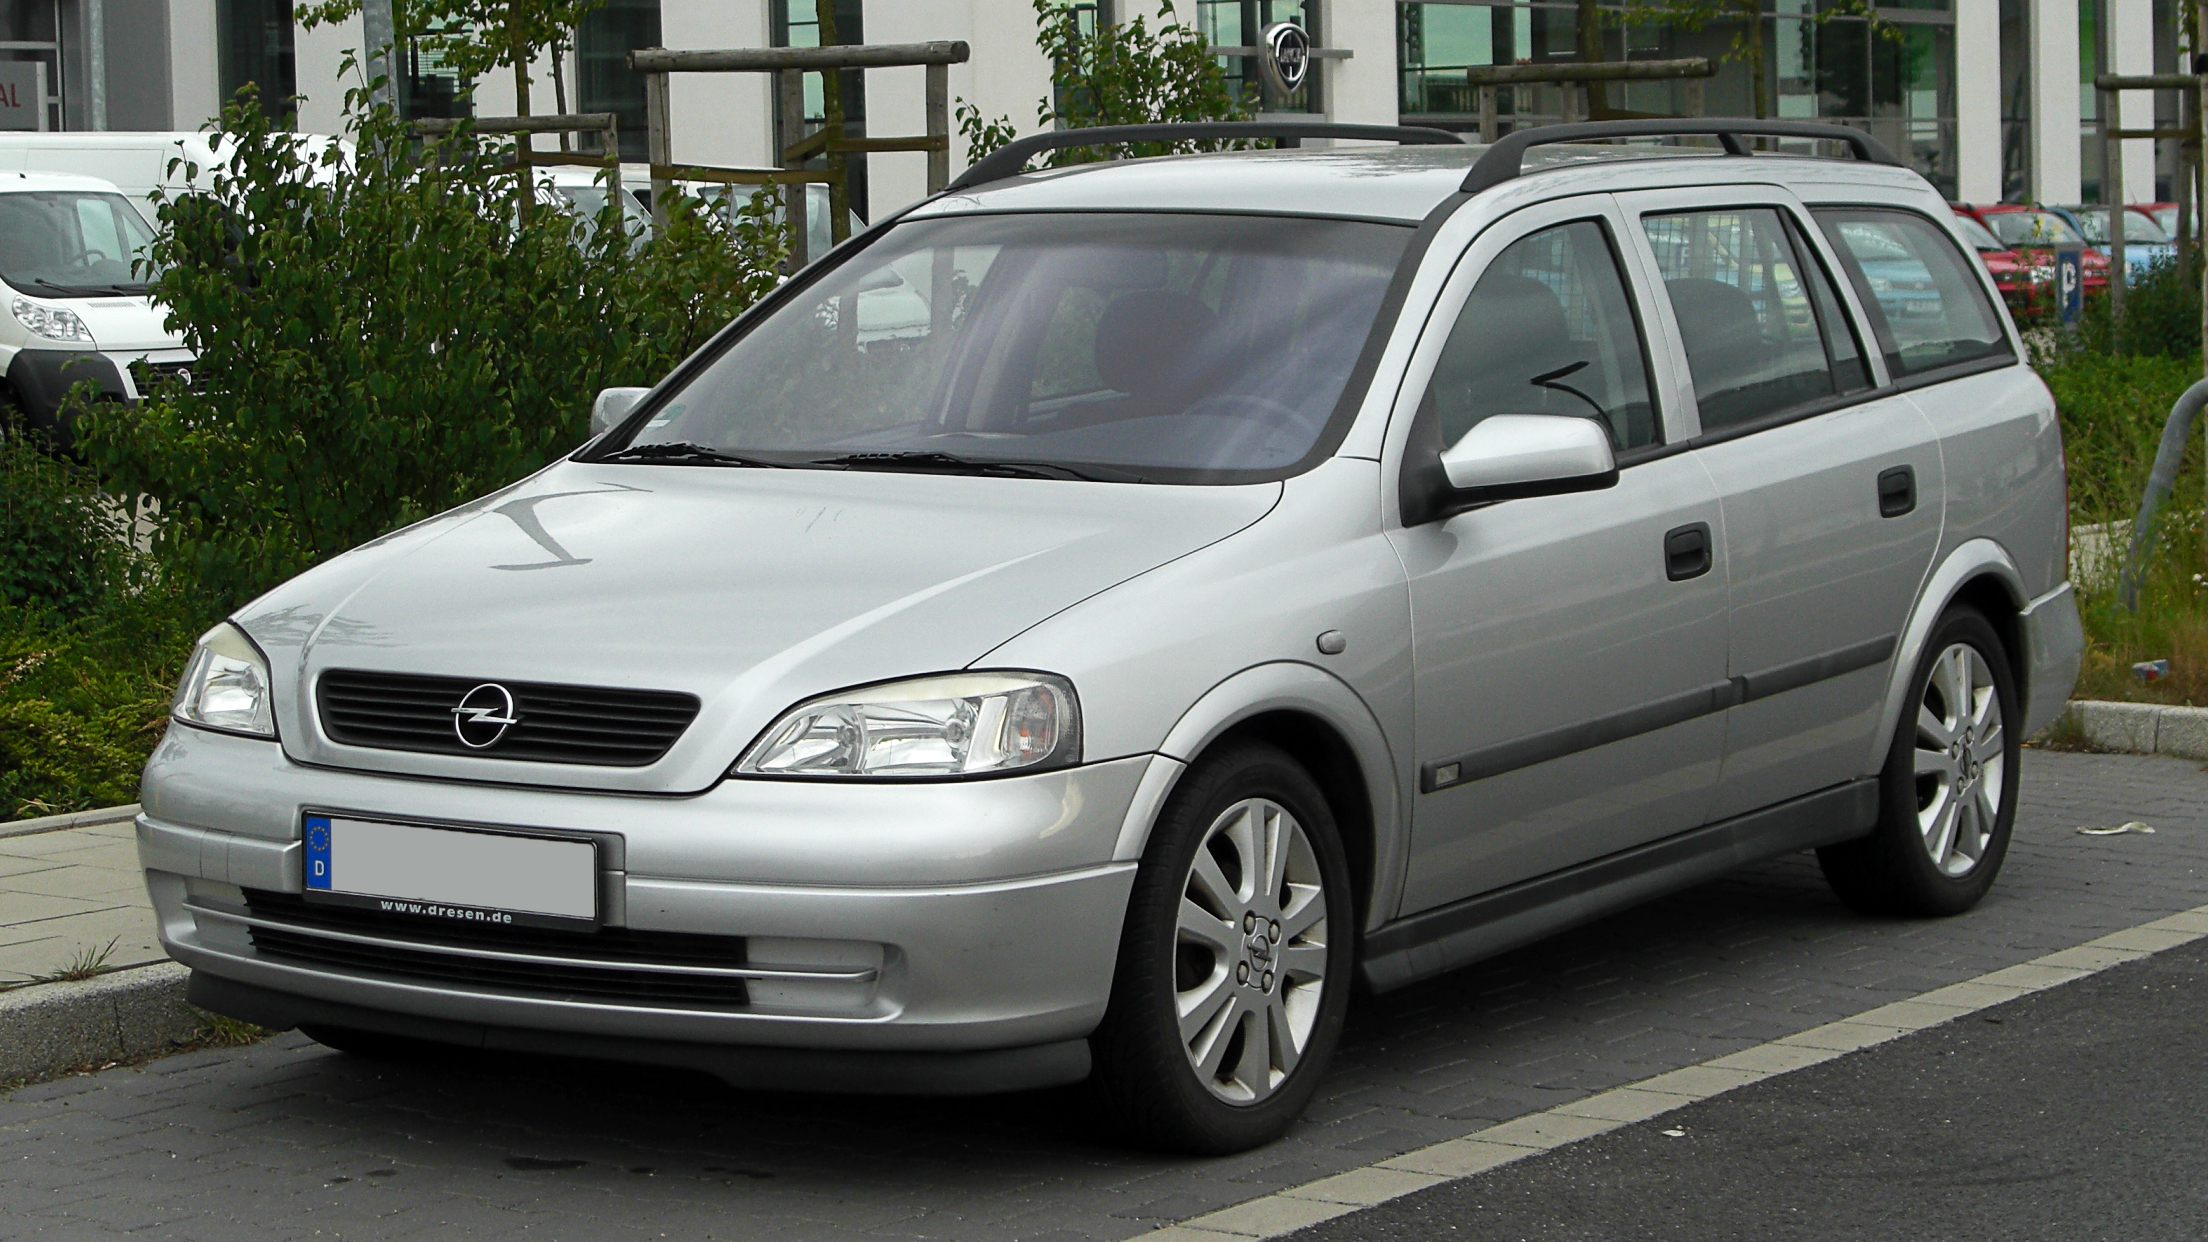 Datei:Opel Astra Caravan 1.6 16V Selection (G ...